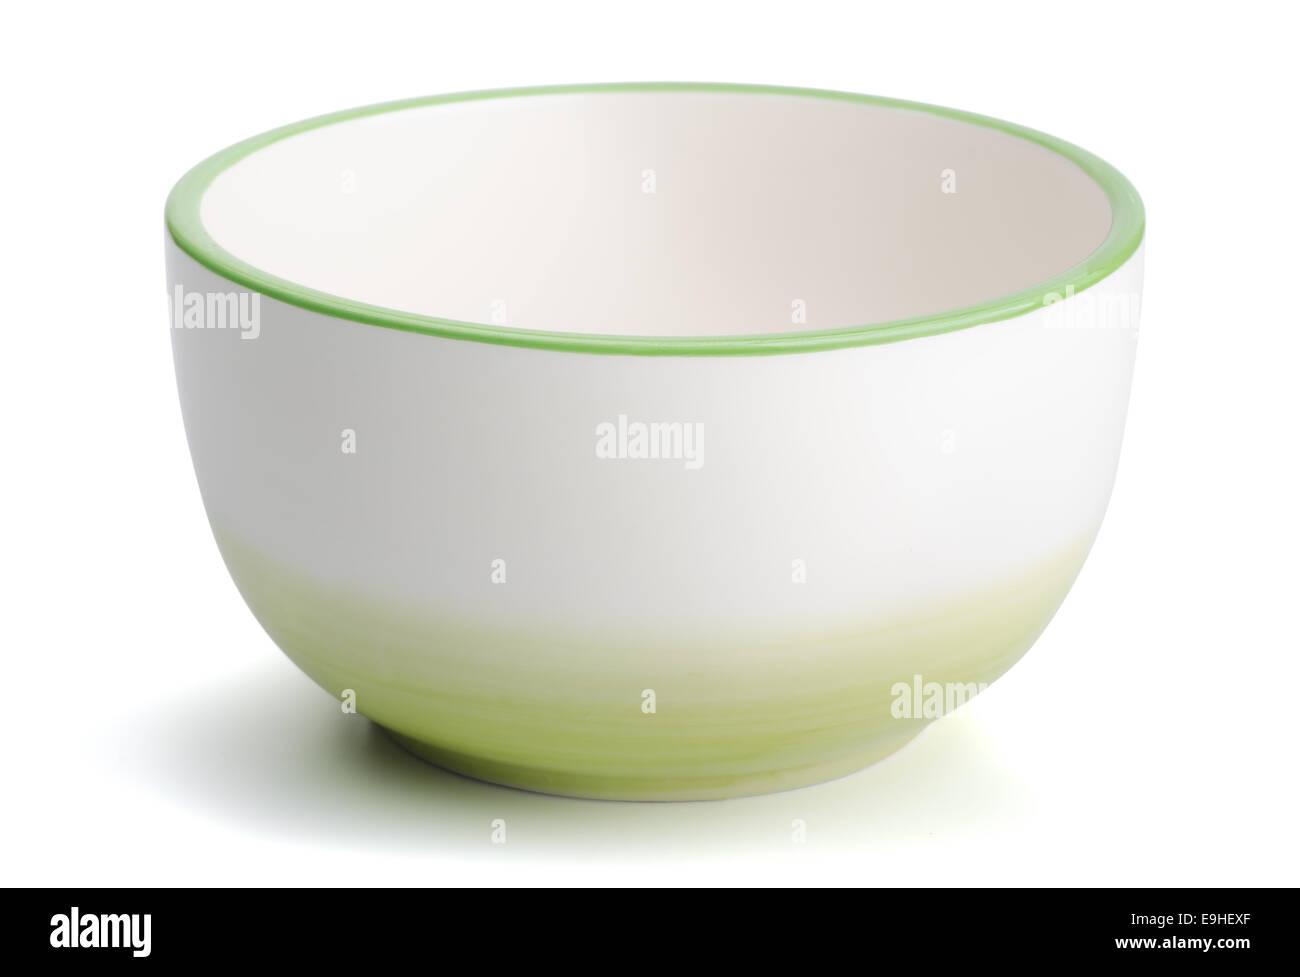 Bowl - Stock Image